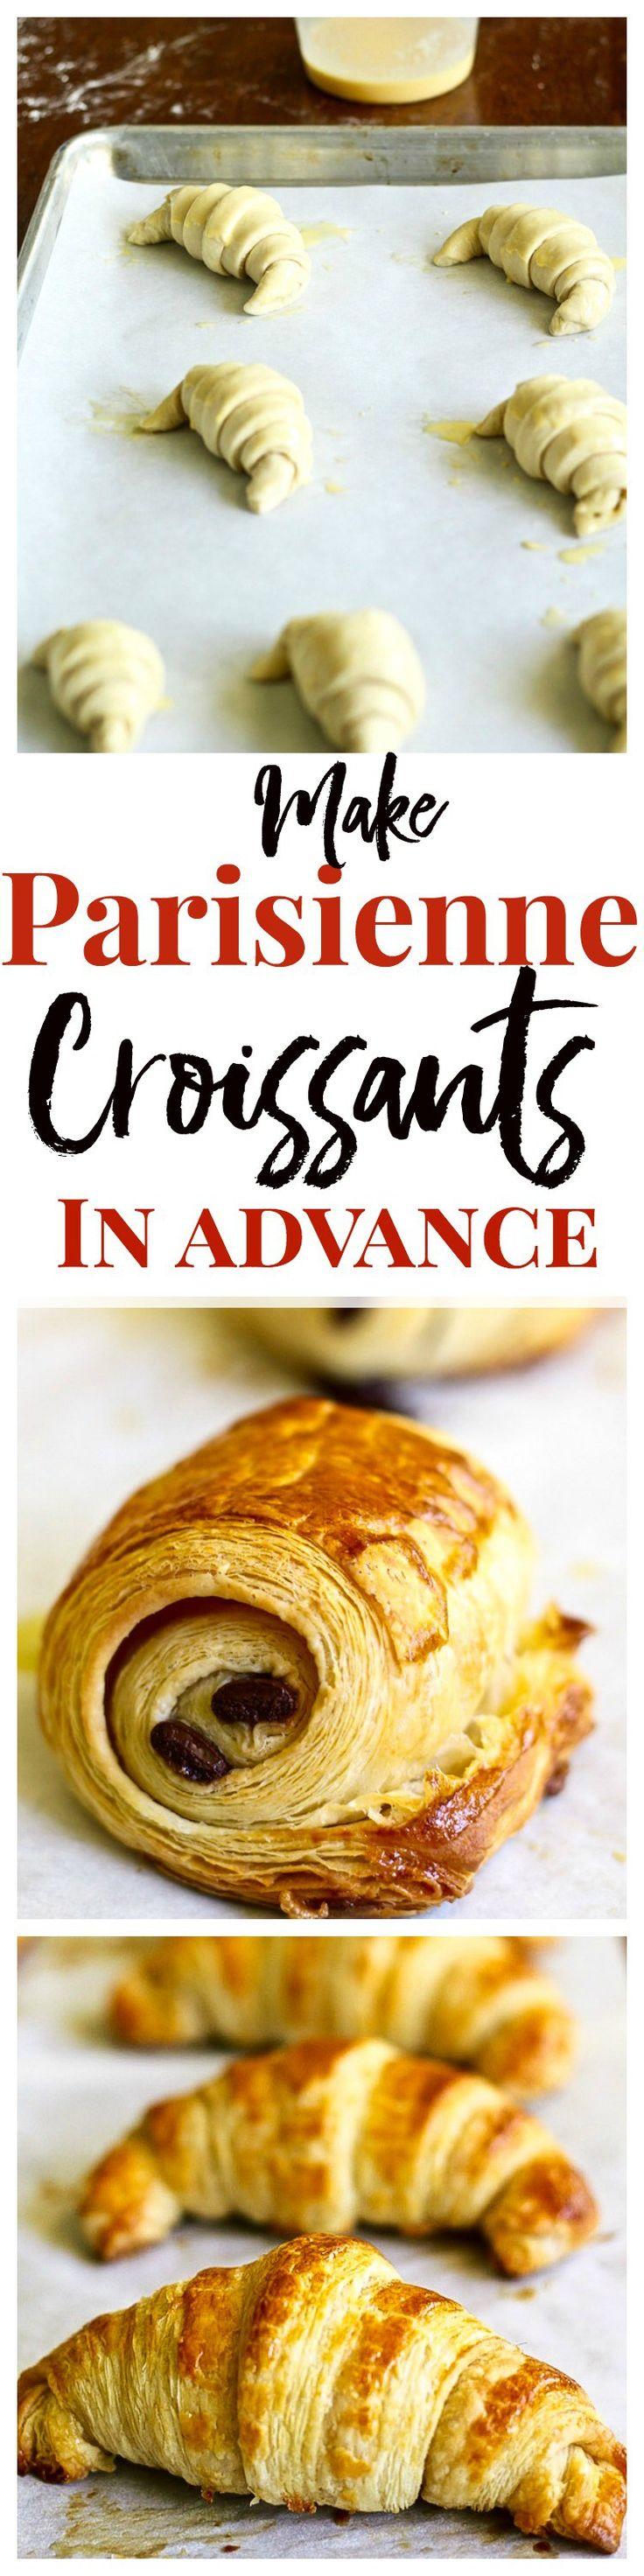 French Croissant Recipe  Chocolate Croissants (40 Stepbystep Photos)